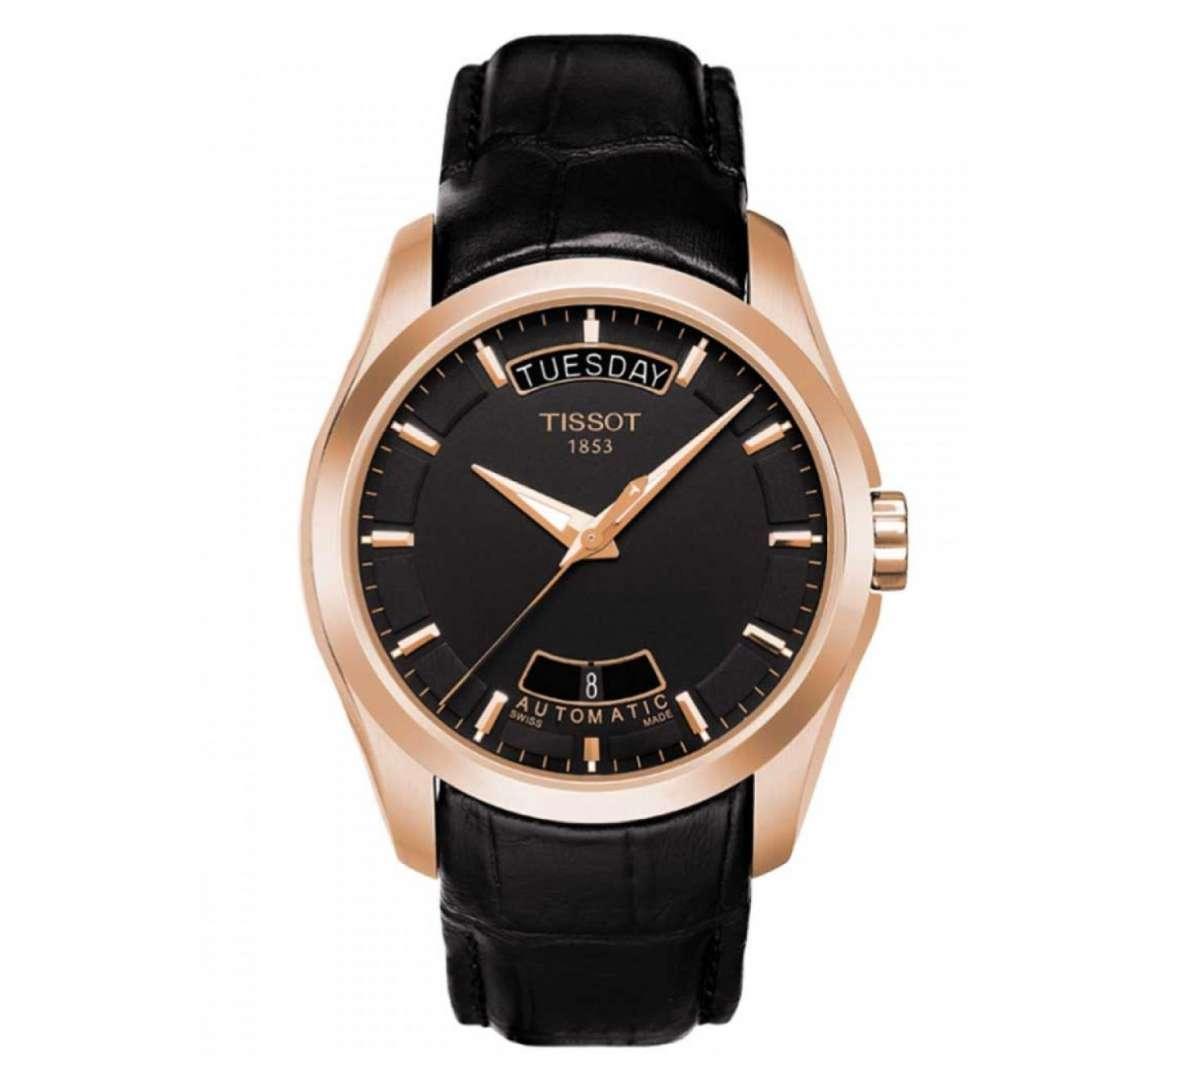 שעון יד אנלוגי tissot t035.407.36.051.00 טיסו